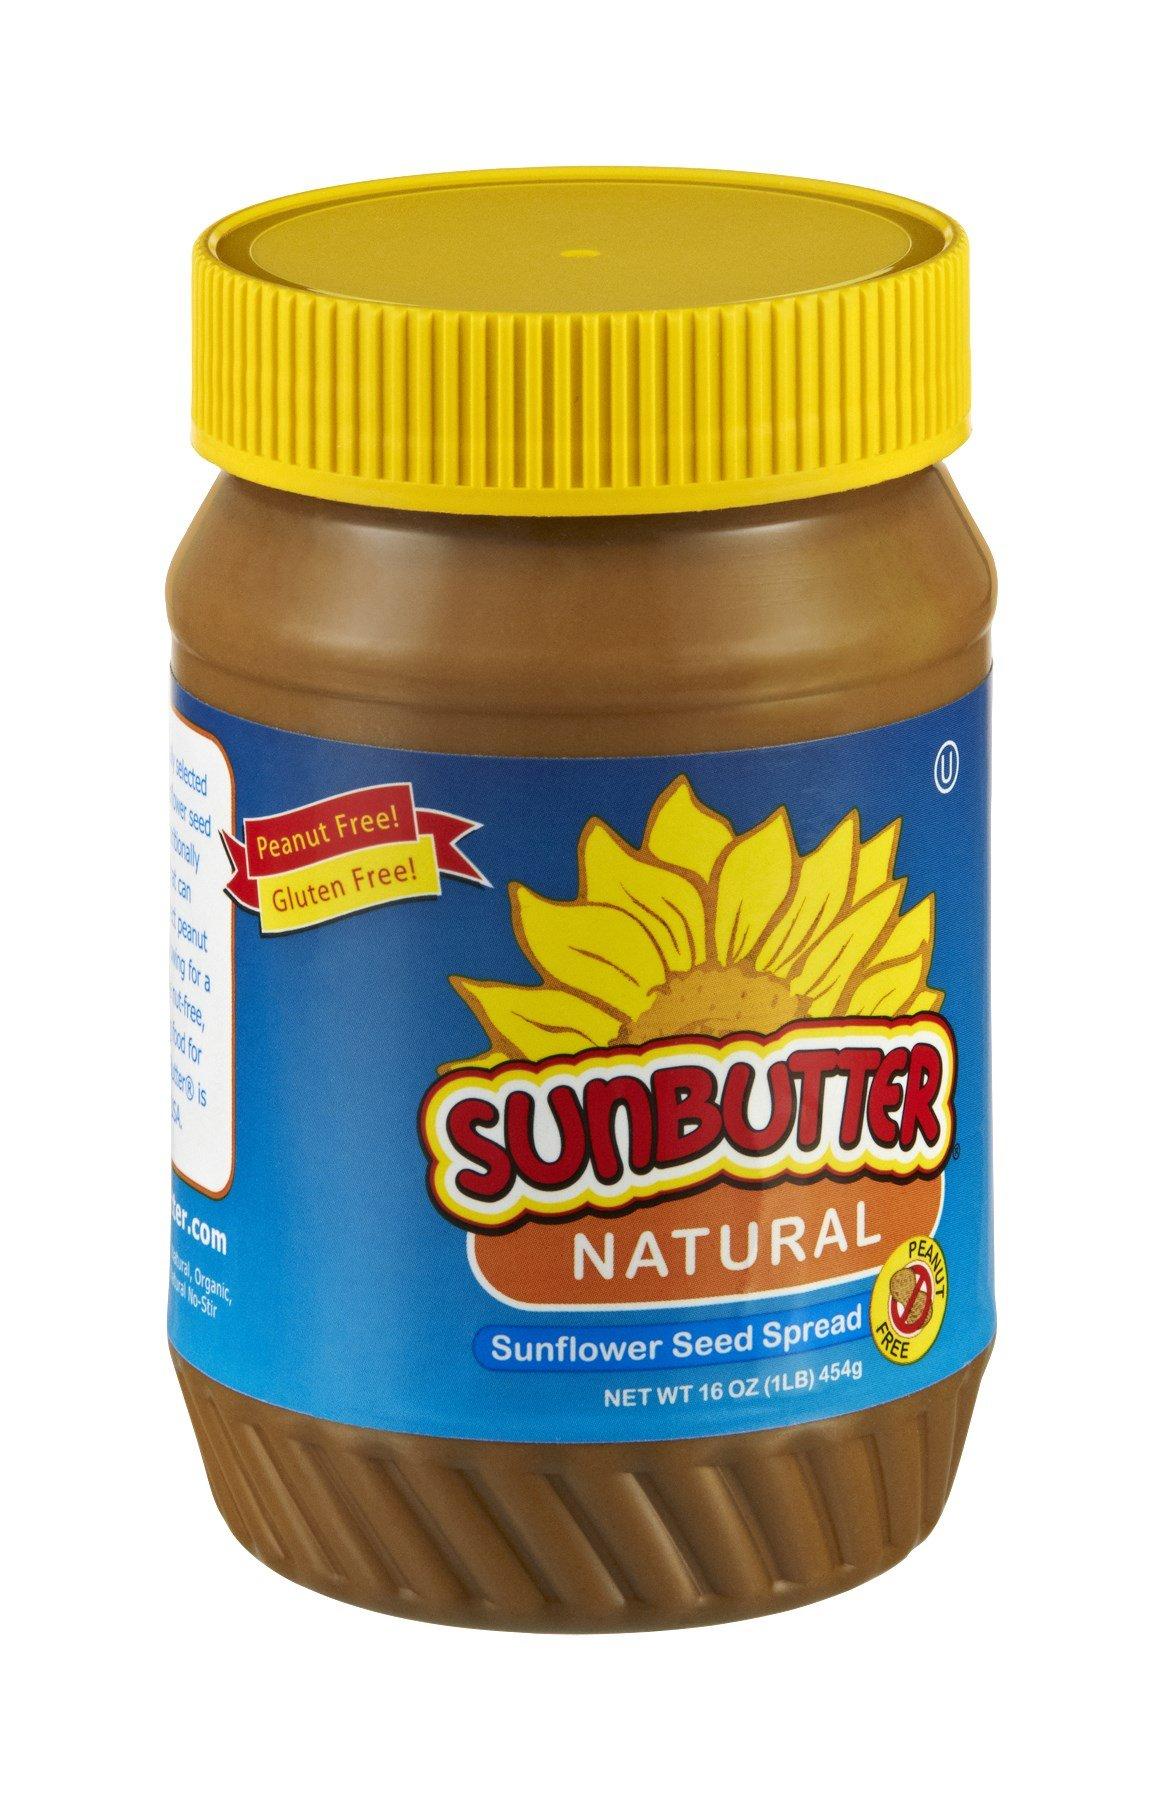 SUNBUTTER NATURAL NUT BTTR SUNFLWR NTRL, 16 OZ